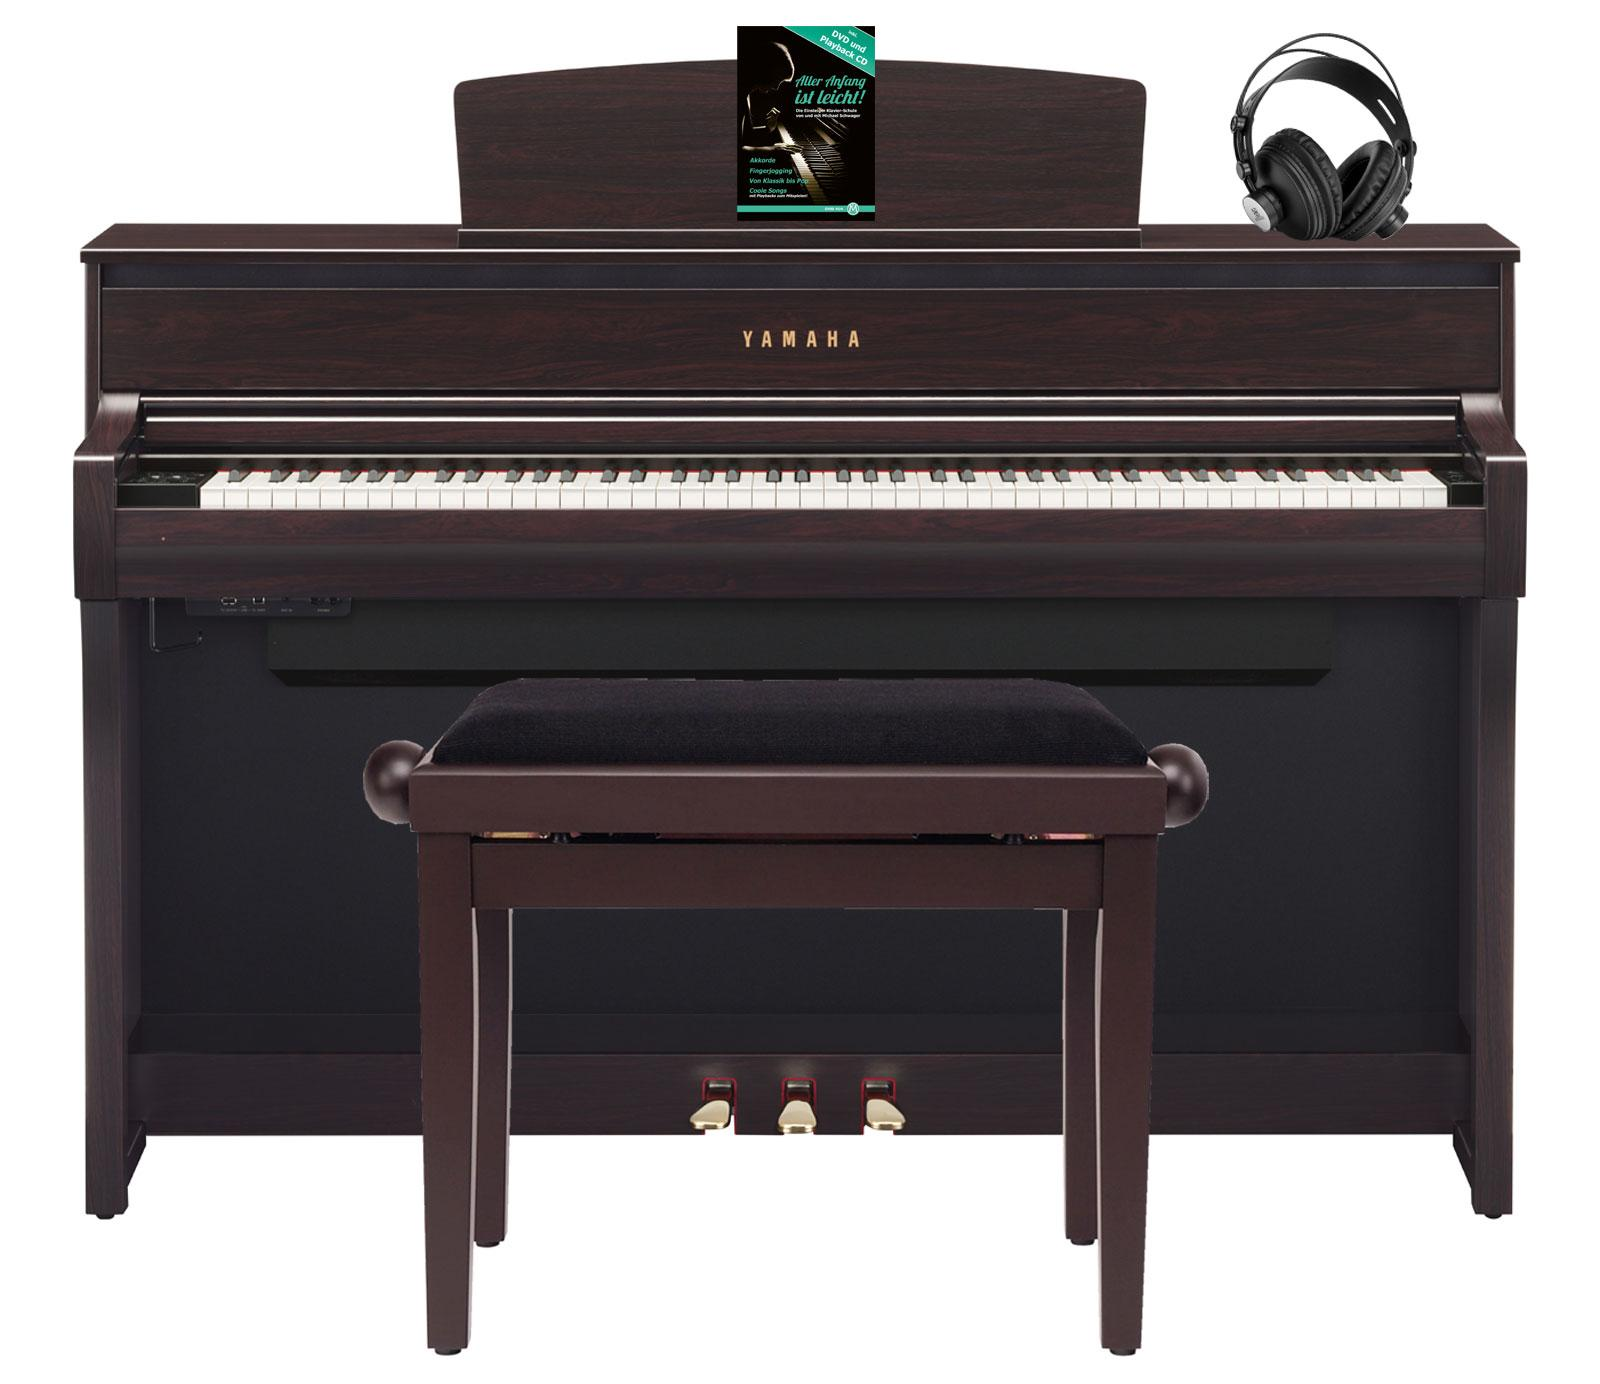 Yamaha clp 675 r digitalpiano rosenholz set mit kopfh rer for Yamaha digital piano clp 535